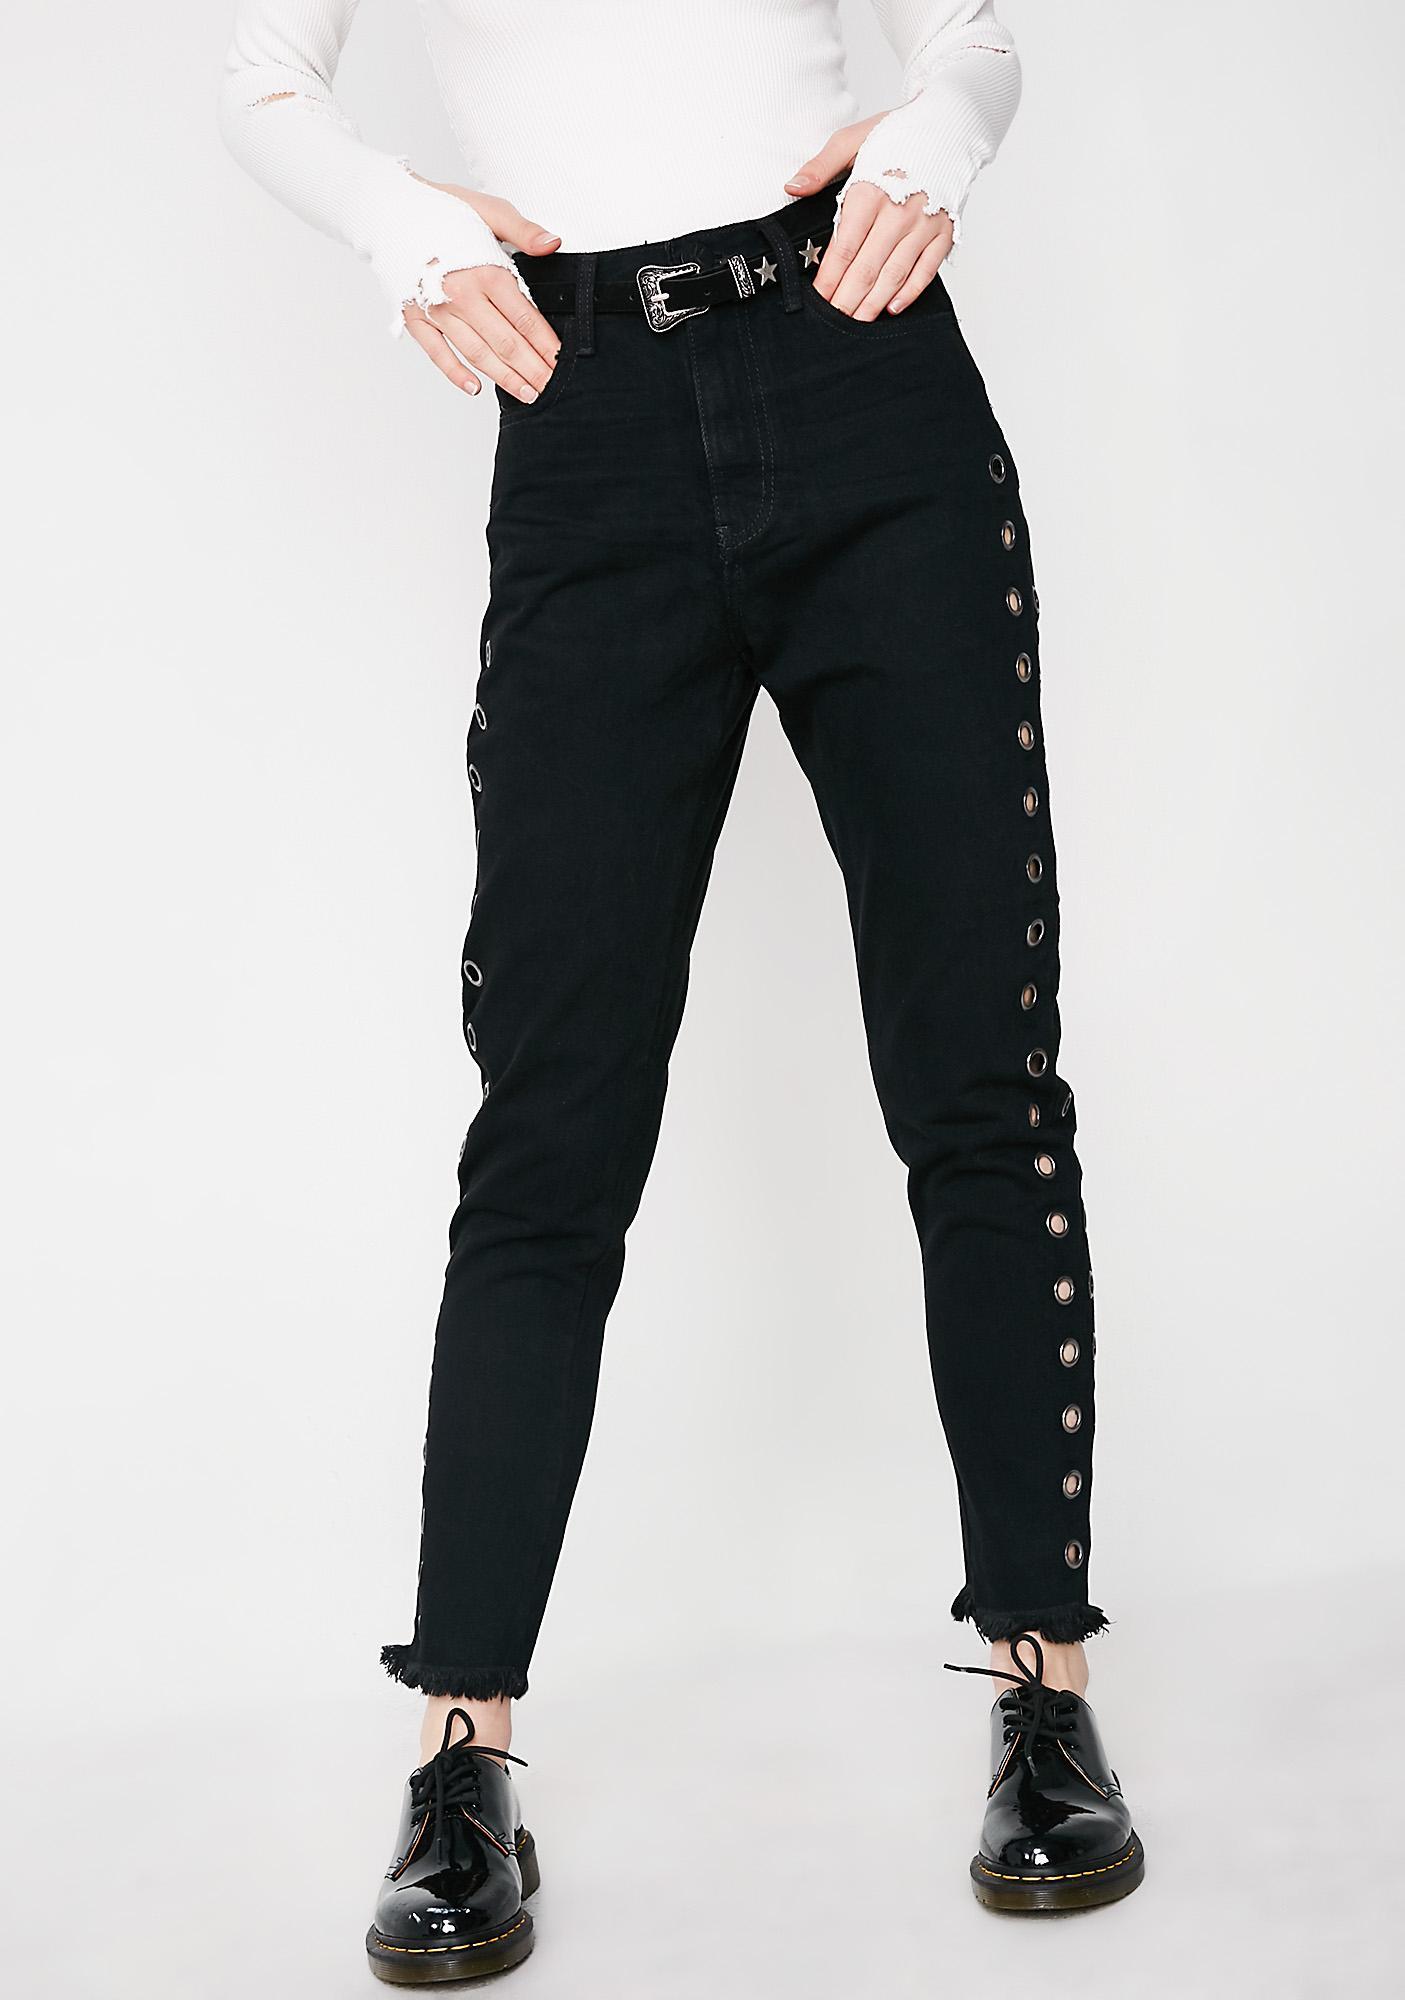 One Teaspoon Legend High Waist Mom Jeans